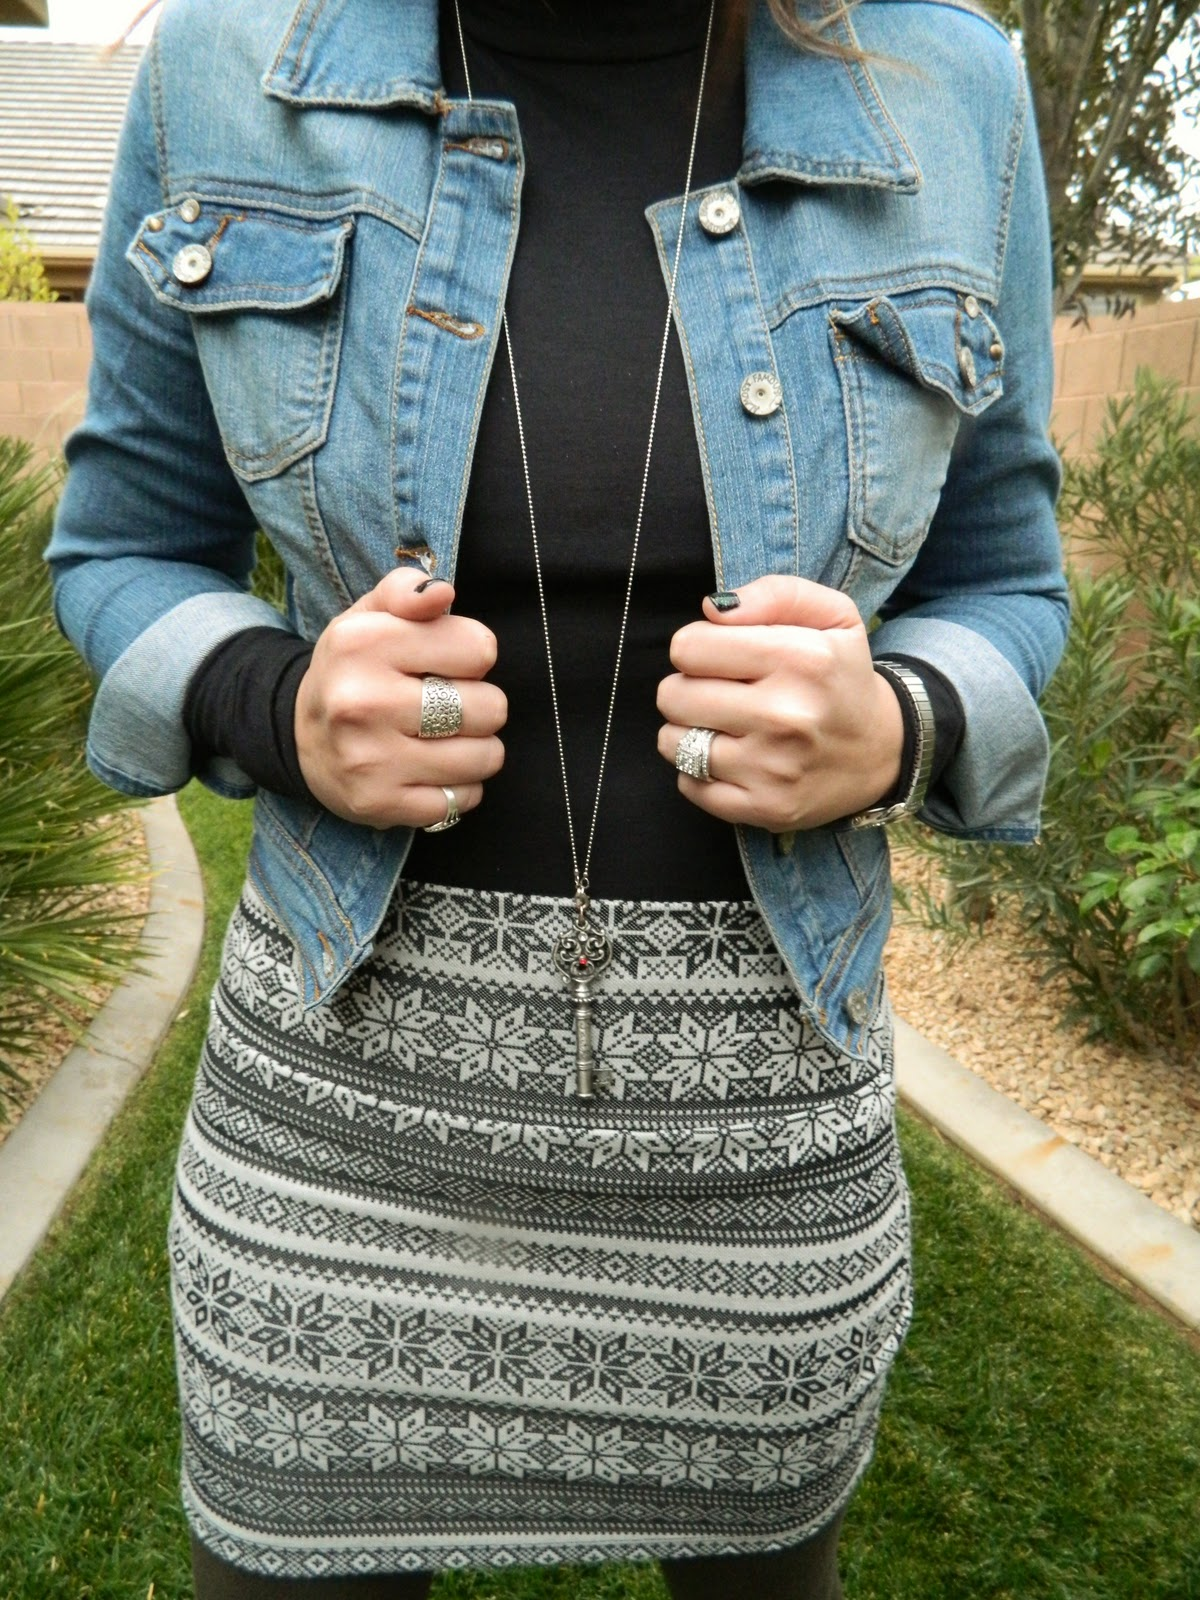 jean jacket, key necklace, black top, grey skirt